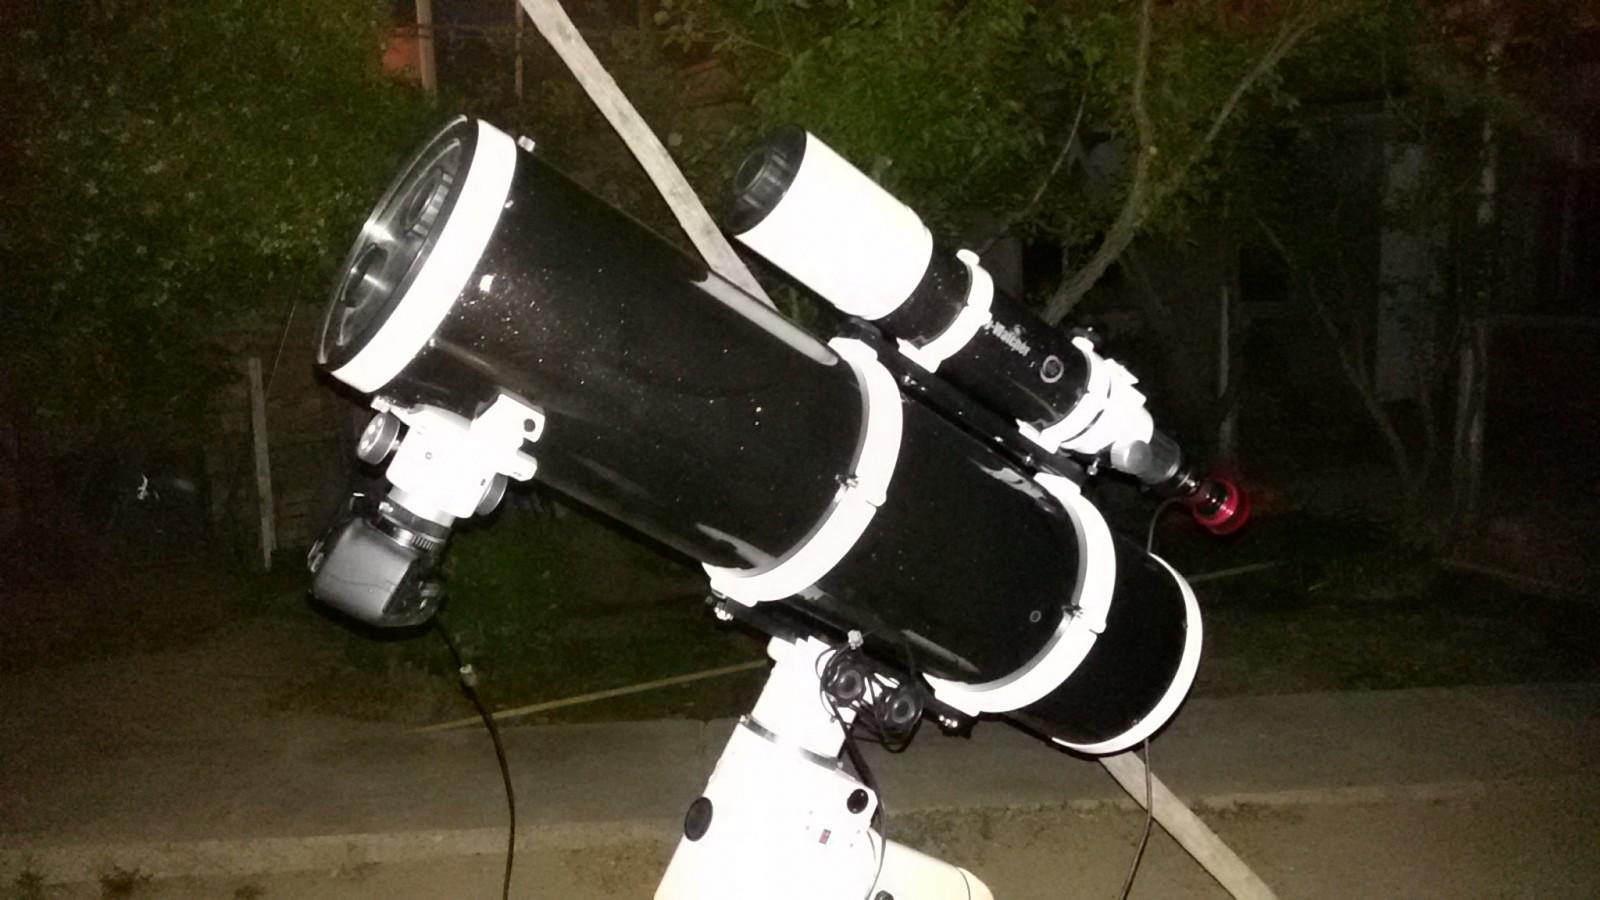 Telescopio Sky Watcher Explorer 200P + Sky Watcher Evostar 80ED